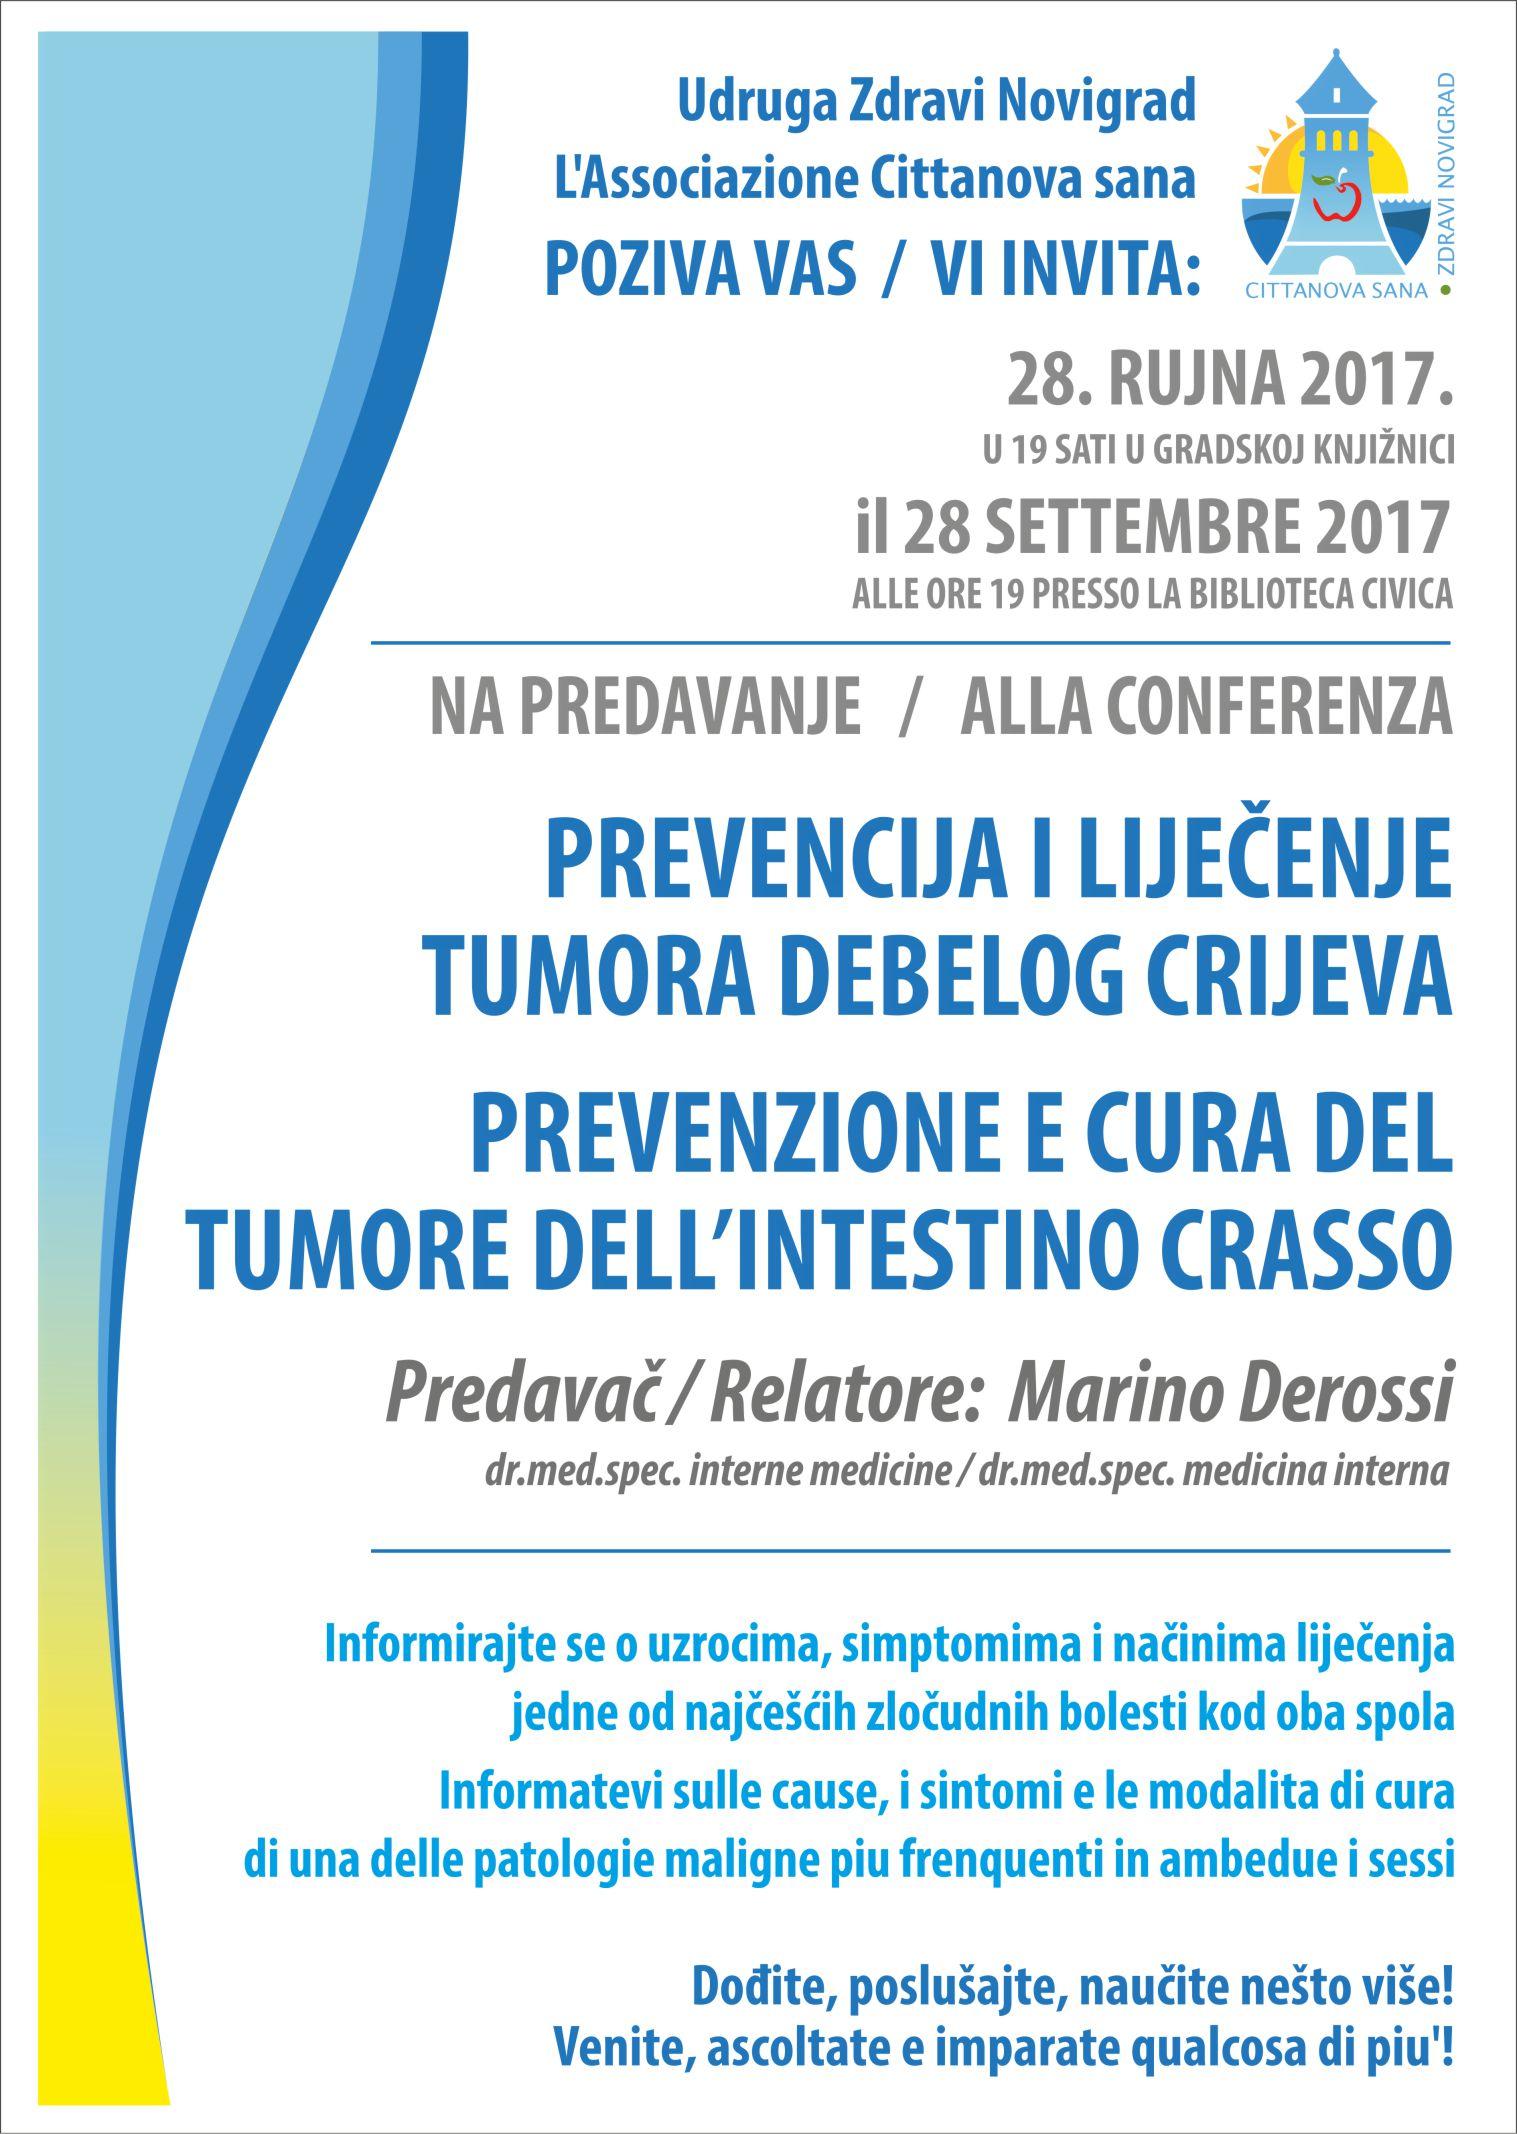 http://www.novigrad.hr/predavanje_prevencija_i_lijechenje_tumora_debelog_crijeva